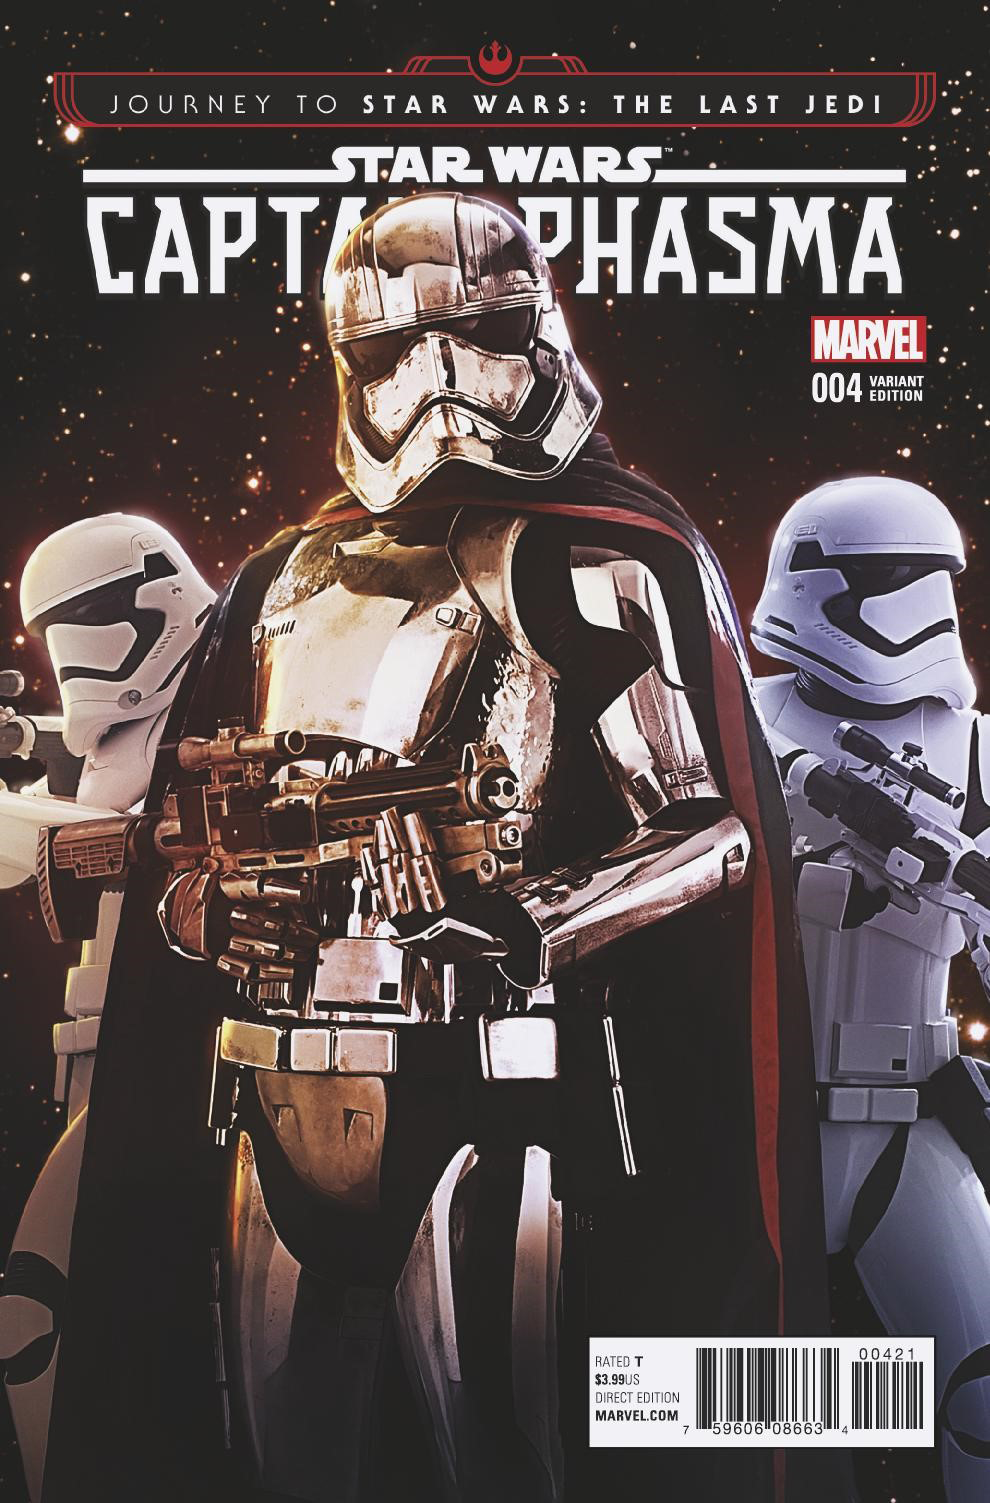 Captain Phasma #4 (Movie Variant Cover) (18.10.2017)